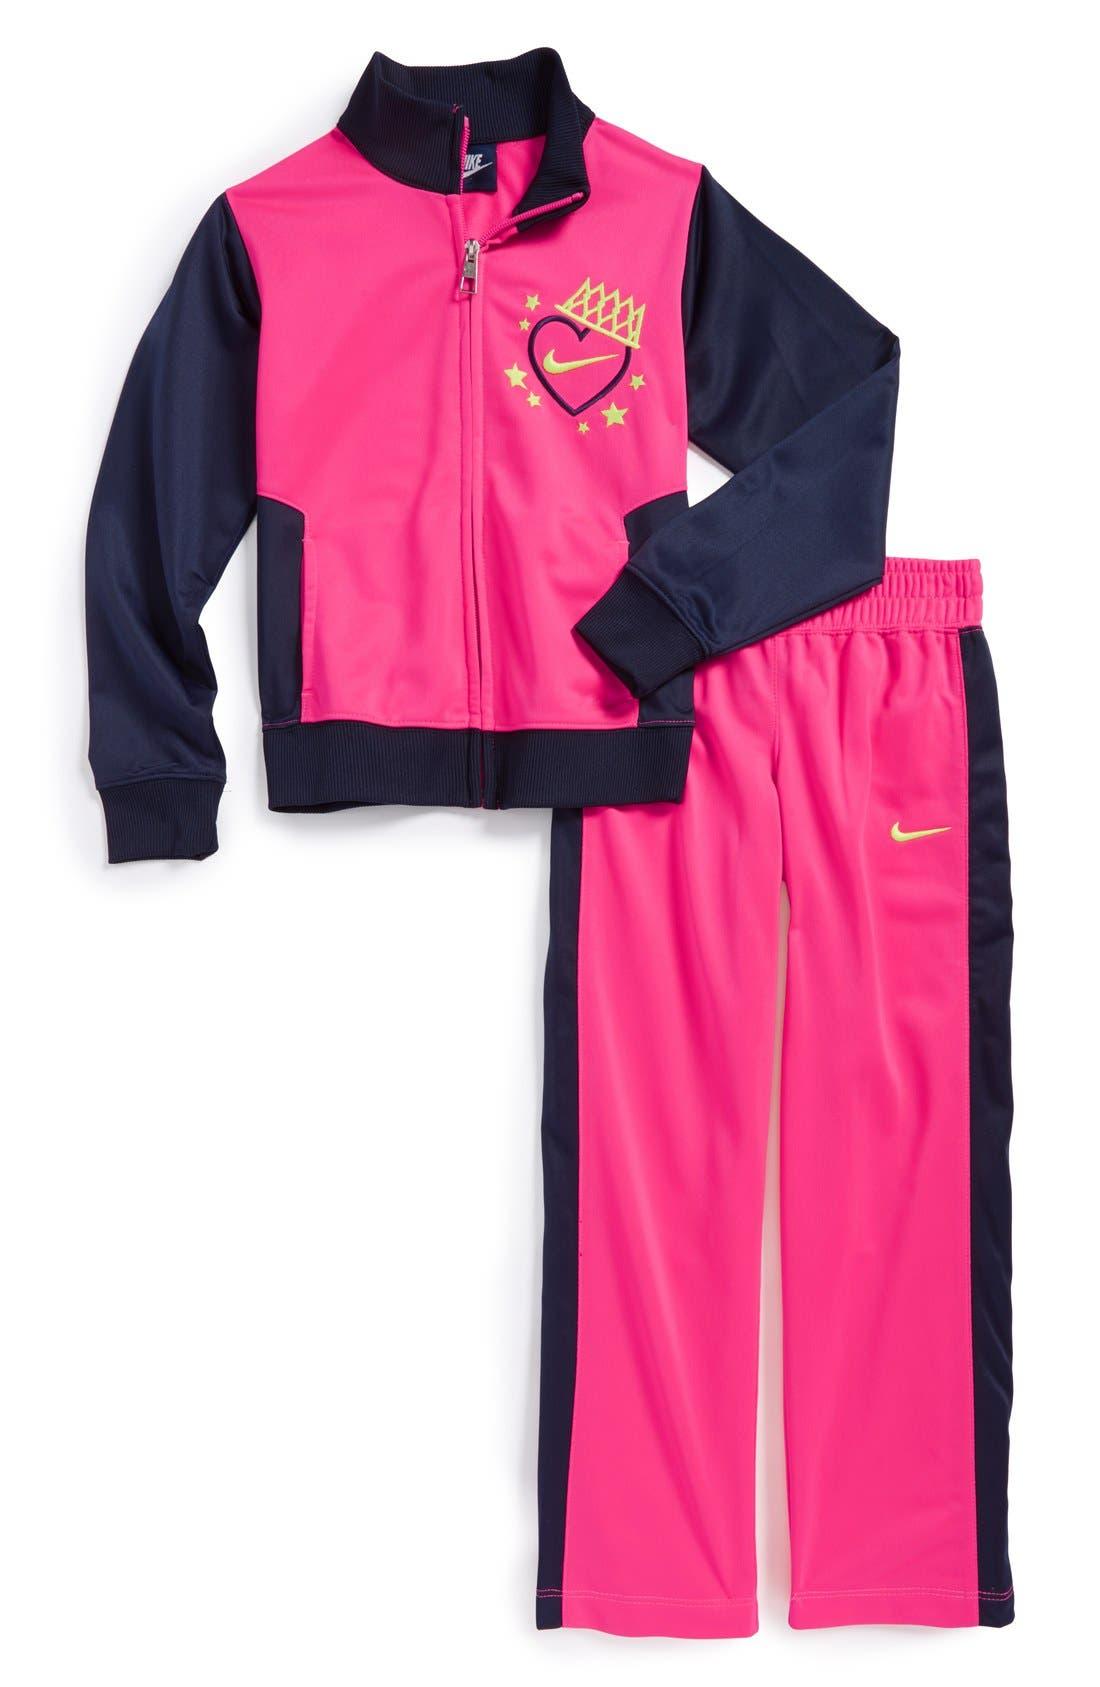 Main Image - Nike 'Tricot' Warm Up Set (Toddler Girls & Little Girls)